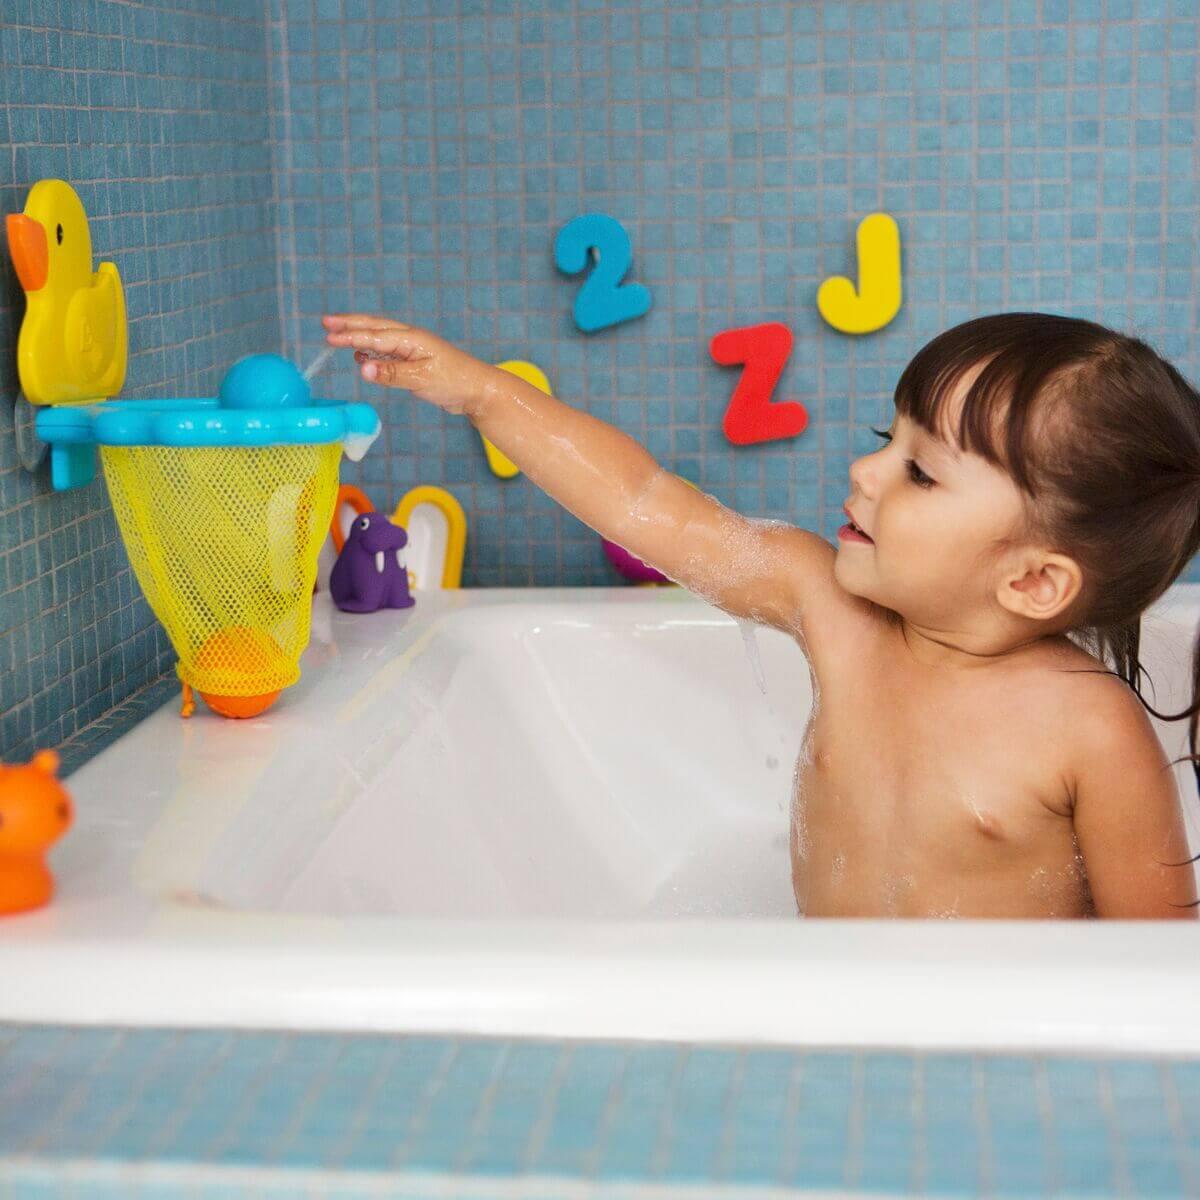 Чем занять ребенка в ванной ❗️☘️ ( ͡ʘ ͜ʖ ͡ʘ)